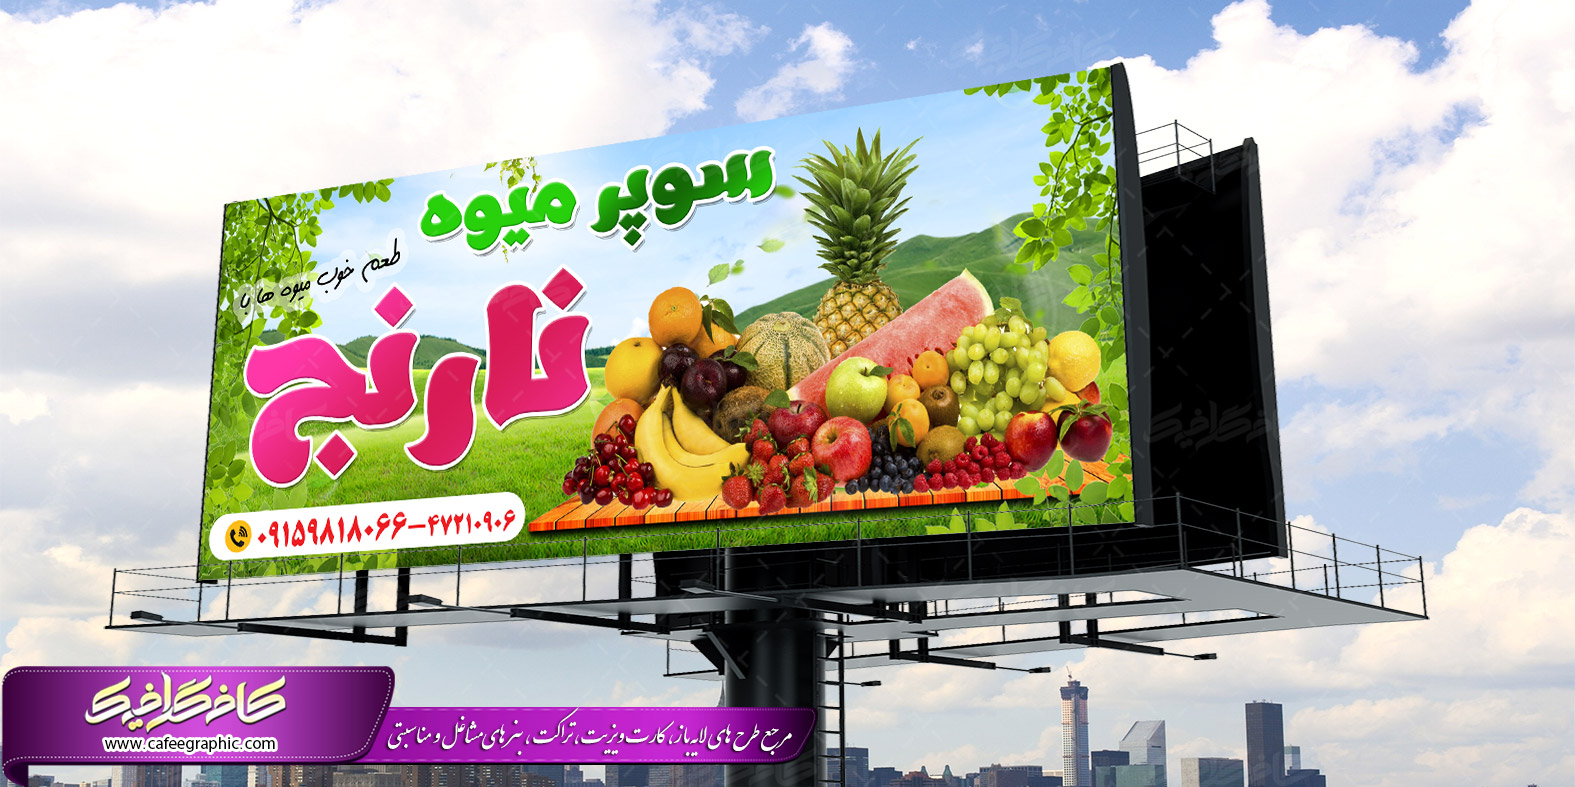 بنر میوه فروشی، بنر لایه باز میوه ،نمونه بنرسوپر میوه ،دانلود طرح لایه باز میوه فروشی